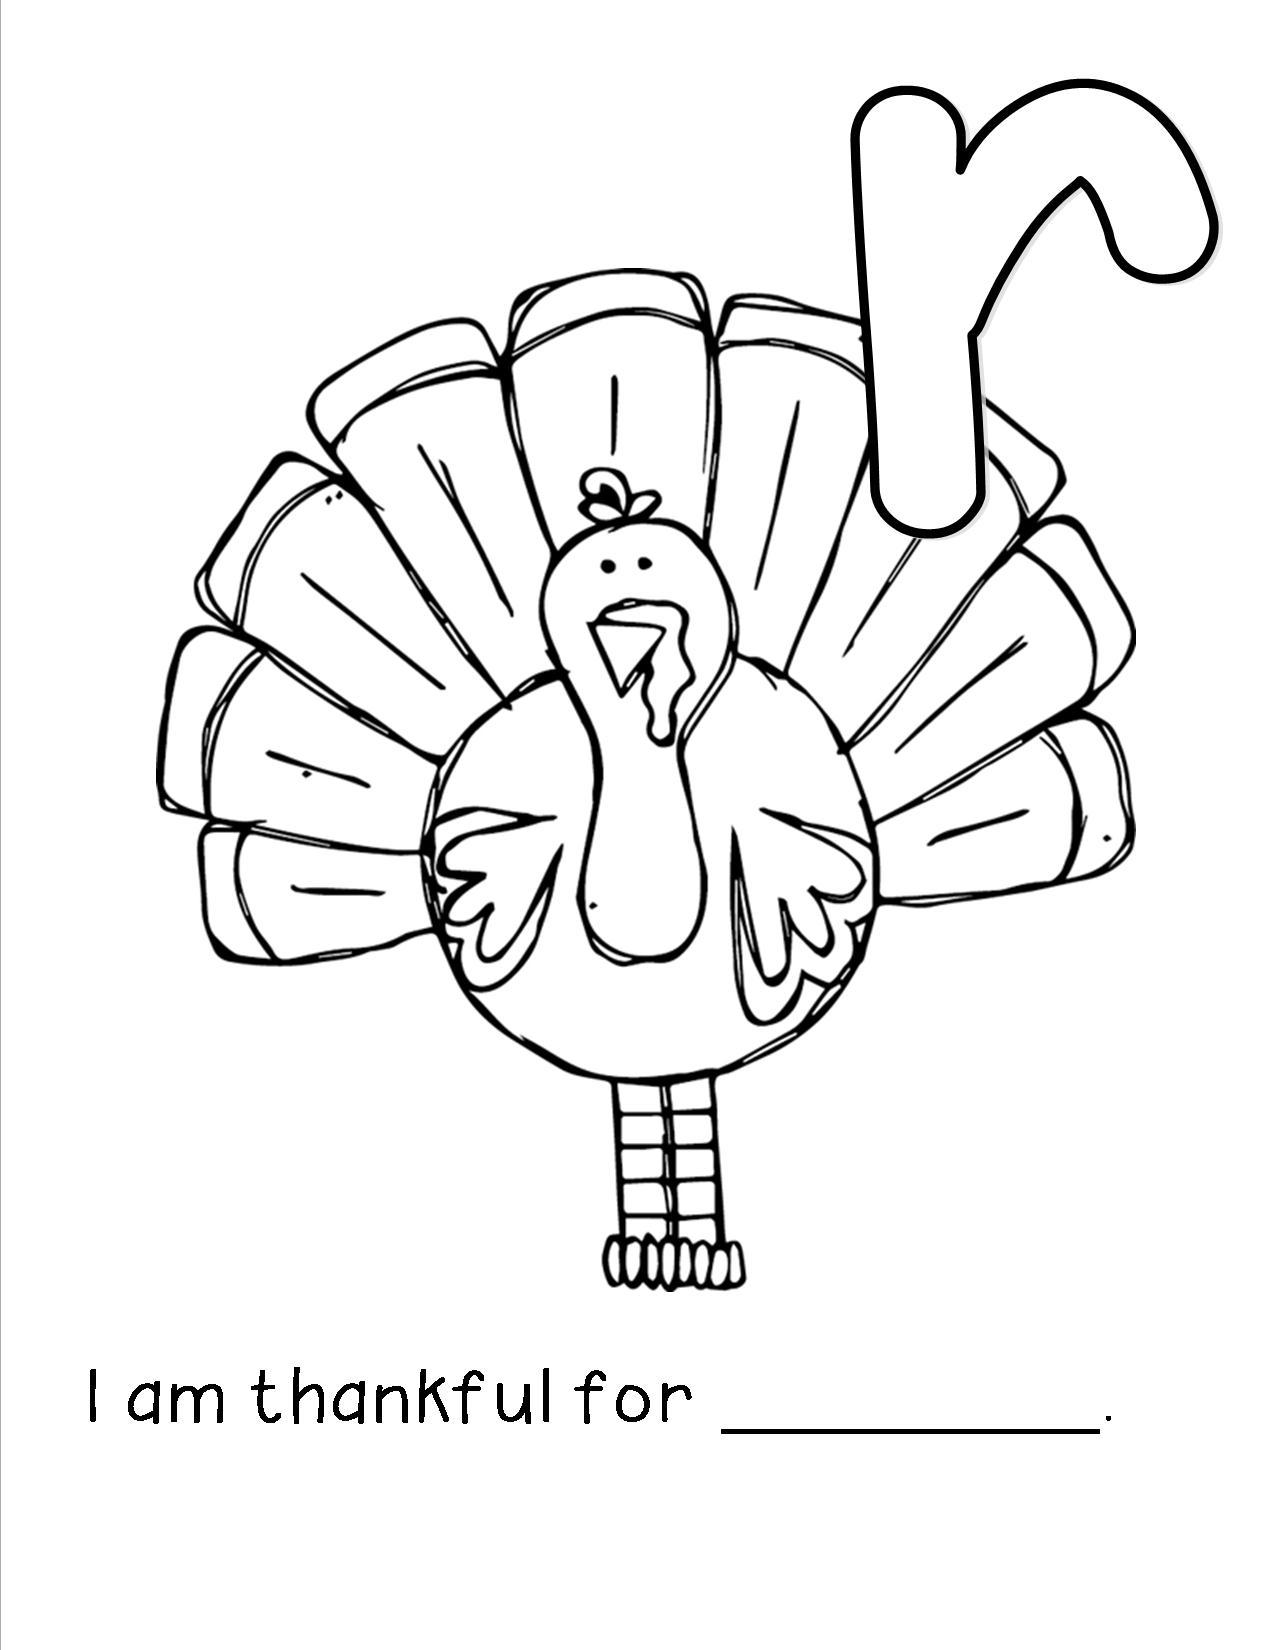 Pz c turkey coloring pages for Color page turkey